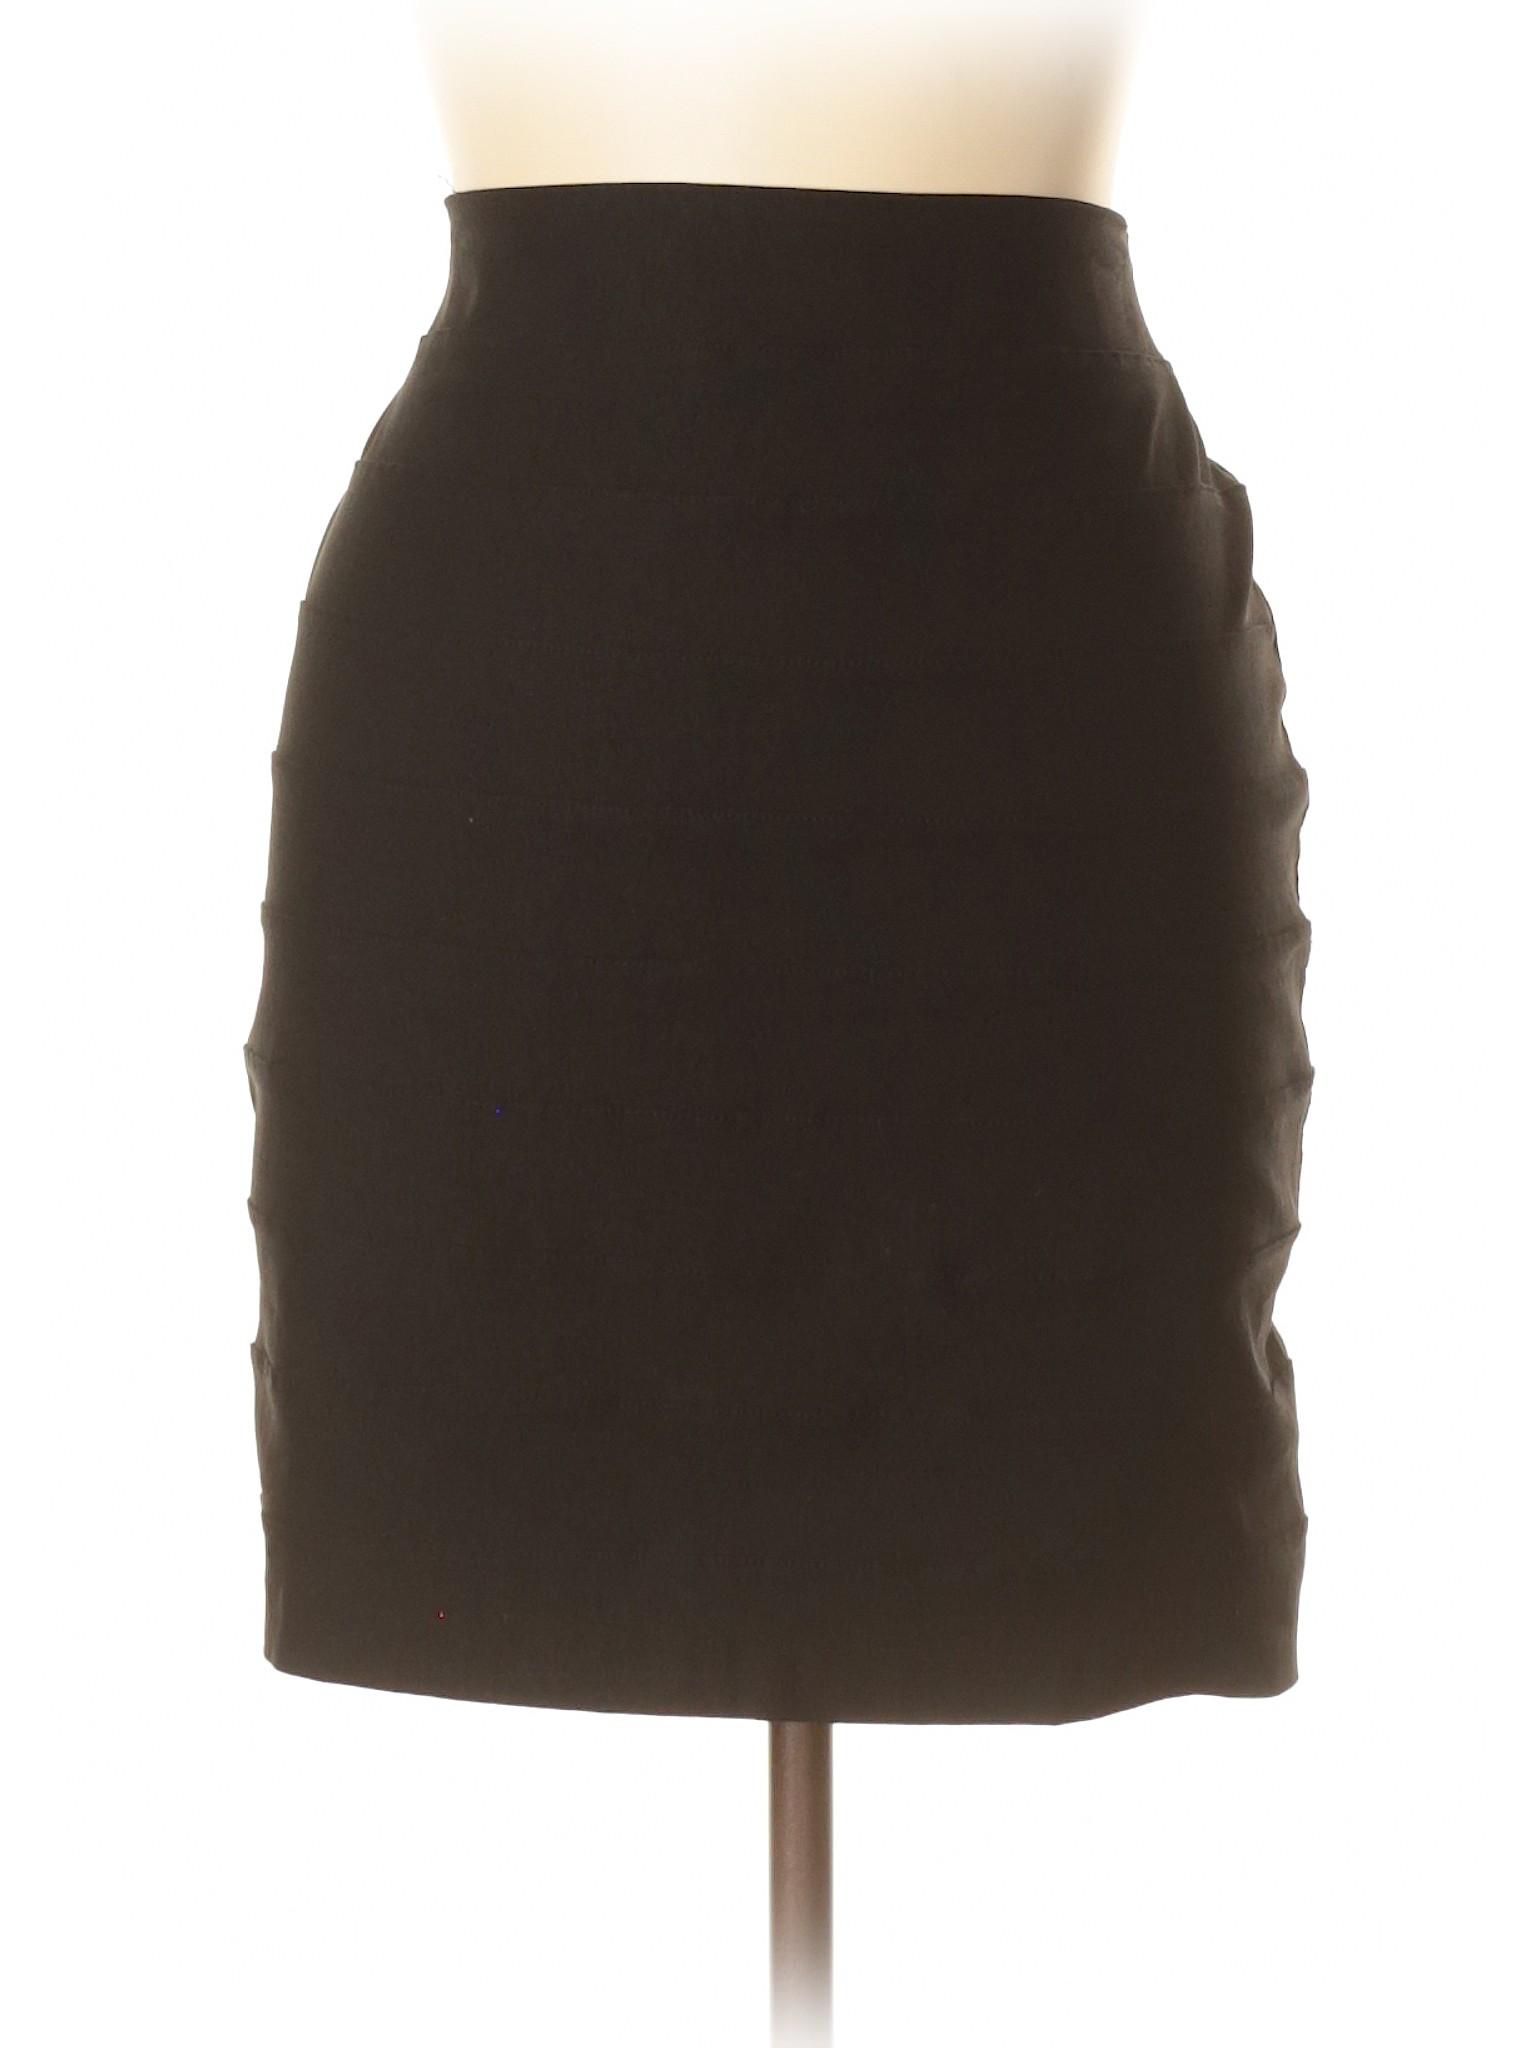 Boutique Skirt Casual Boutique Have leisure Skirt Have Casual Boutique leisure faTrqf1z